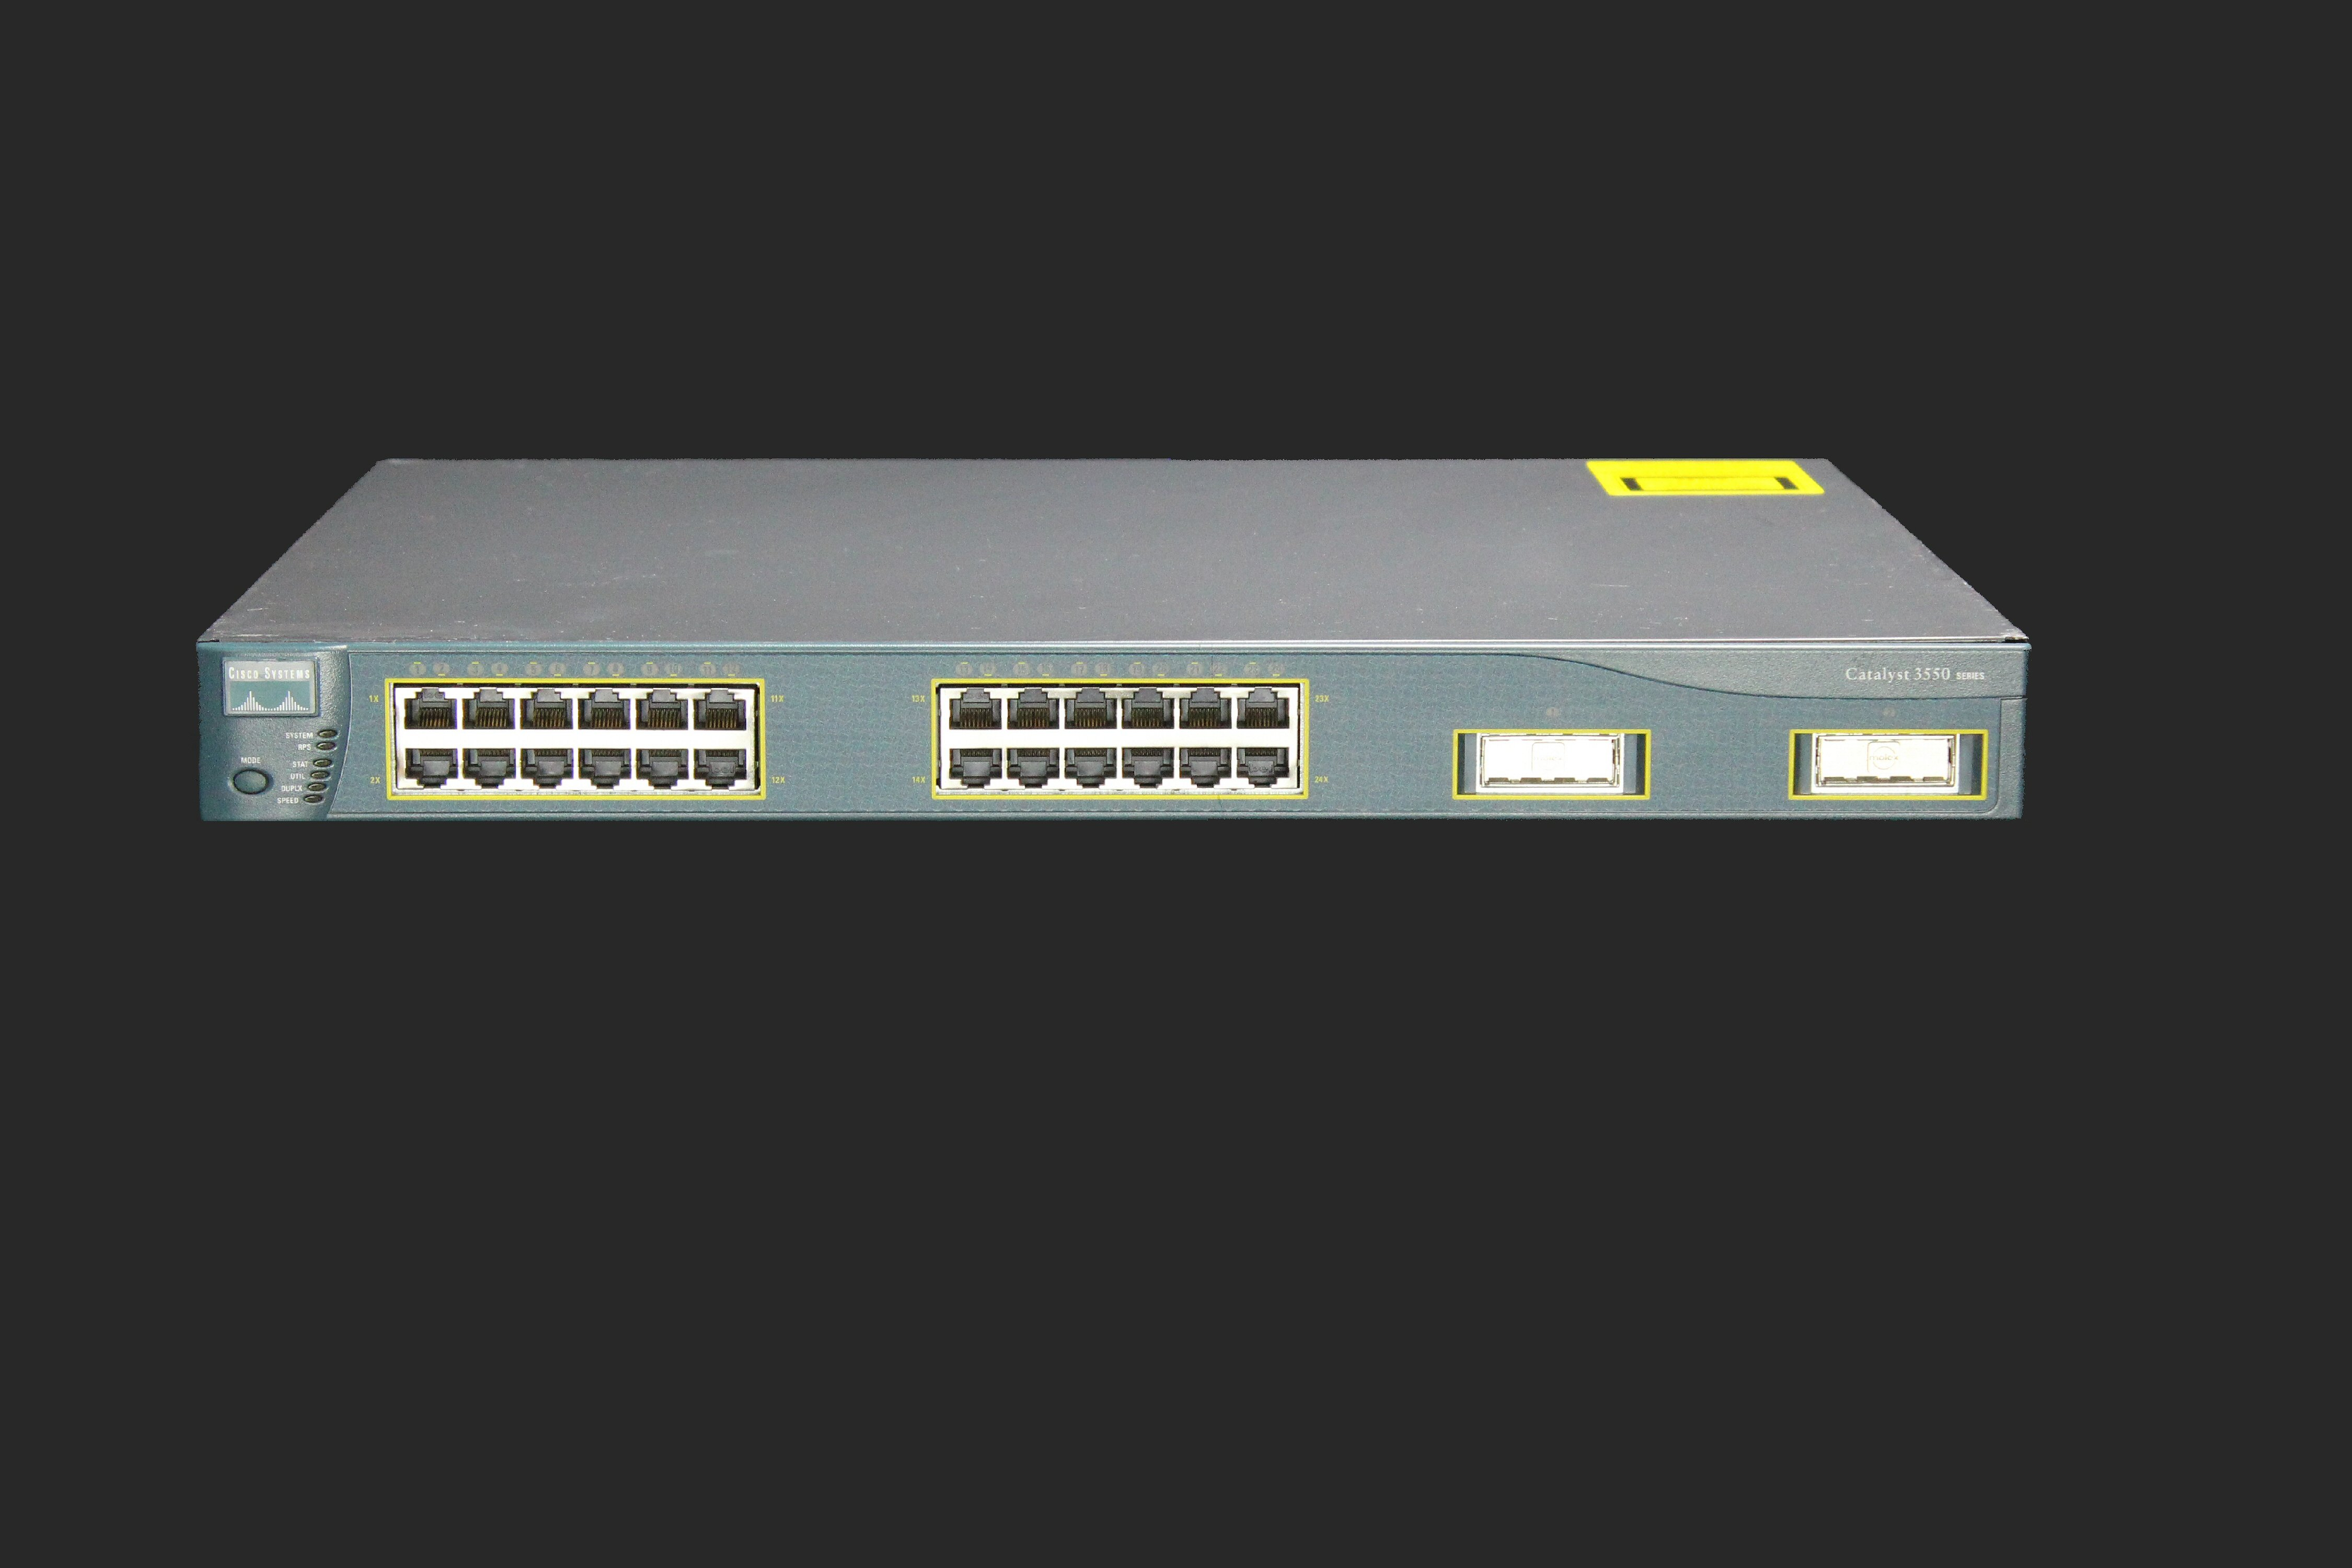 CCNP Security Advanced Lab Kit